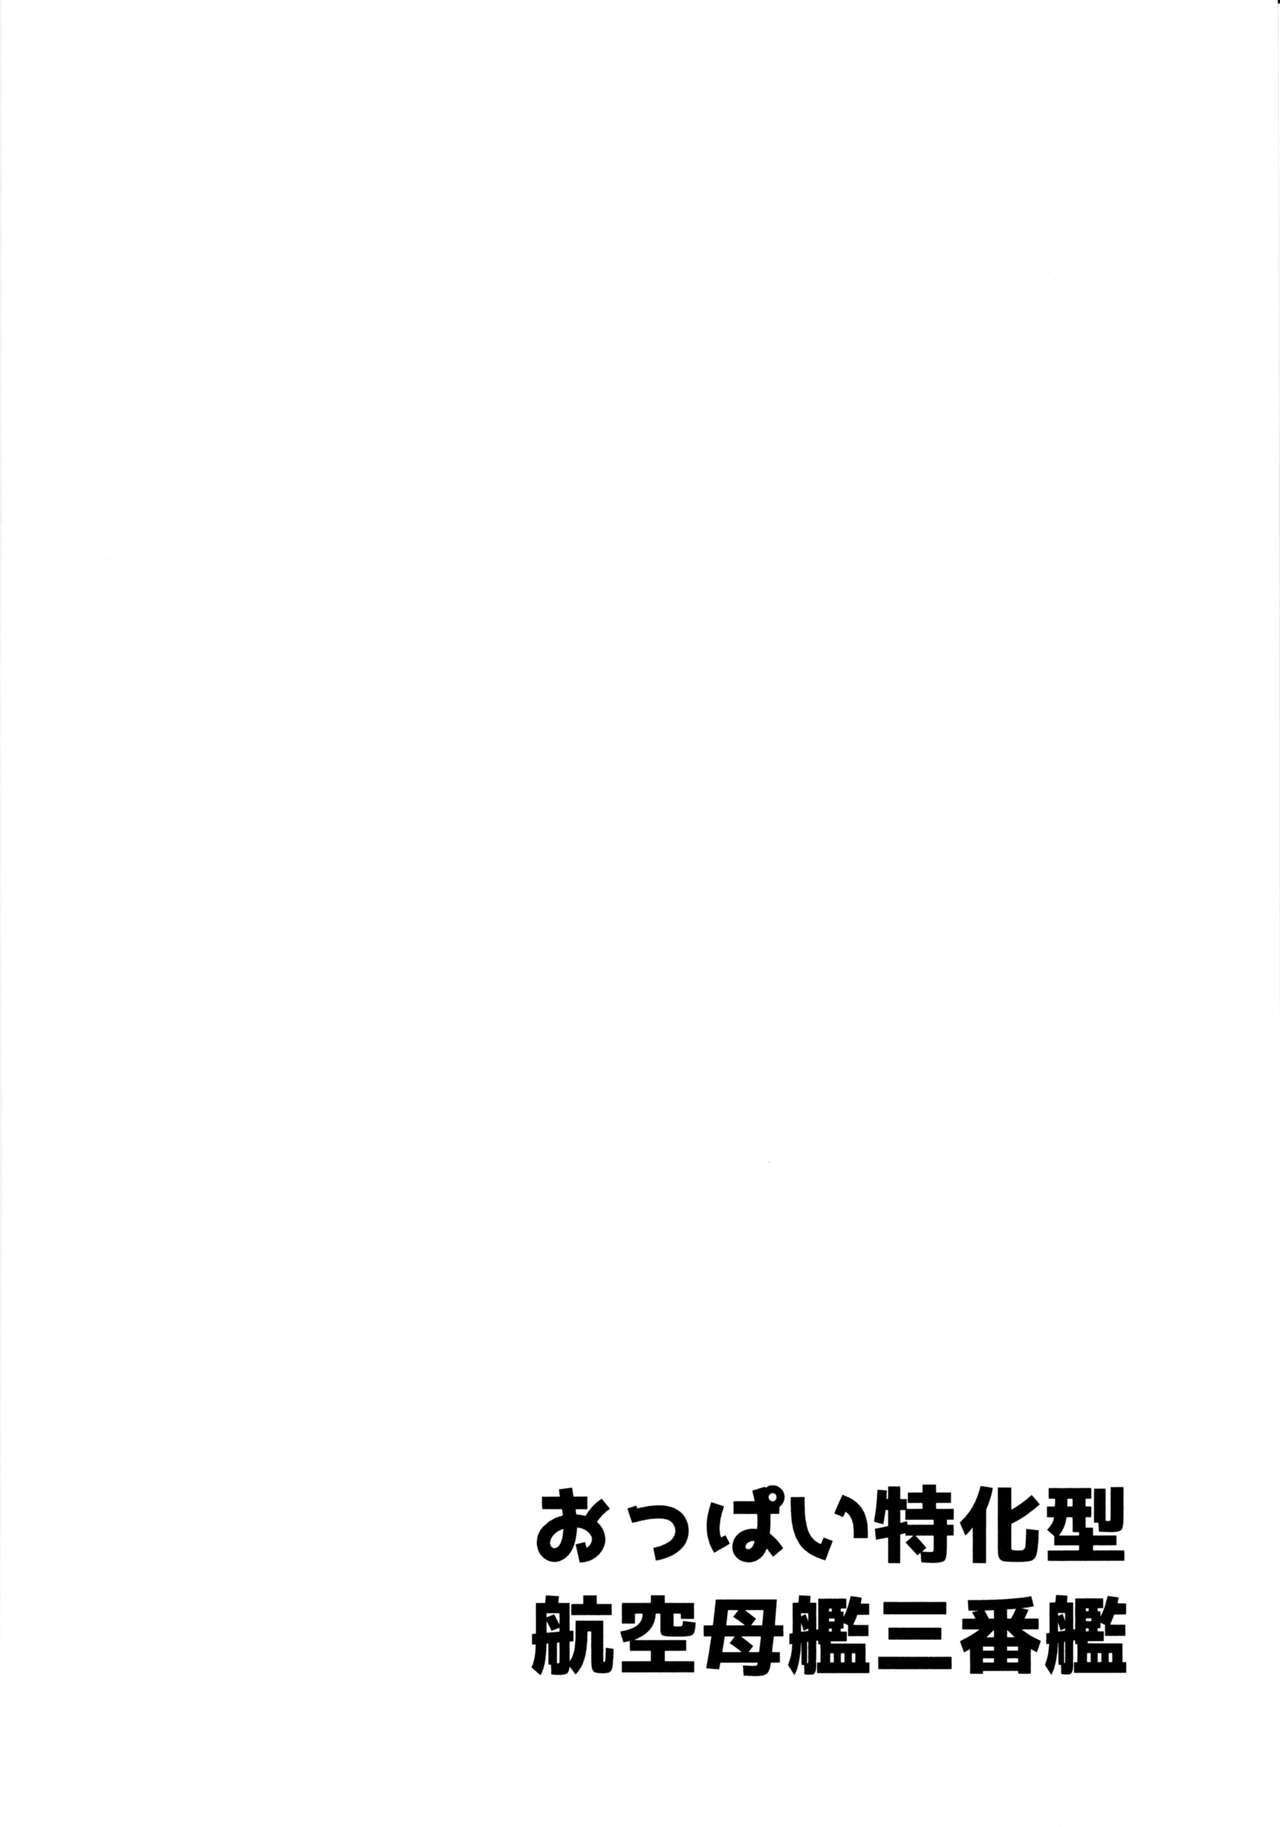 Formidable no Oppai ga Momitakute Shikataganai 2